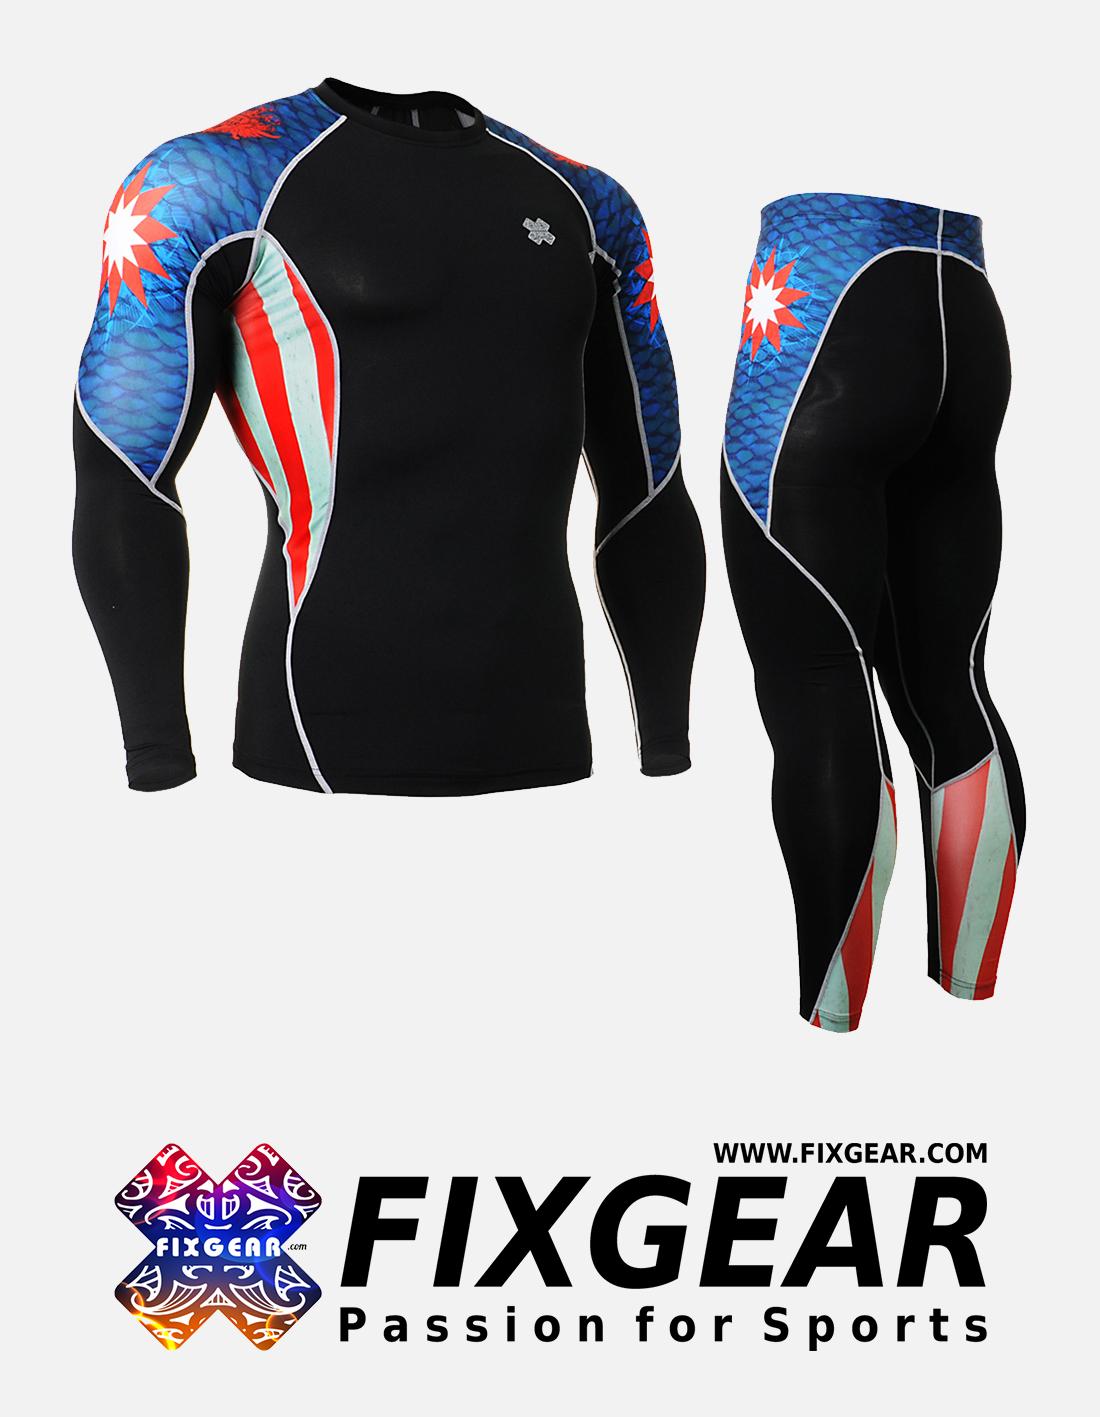 FIXGEAR C2L-P2L-B37 Set Compression Base Layer Shirt & Legging Pants